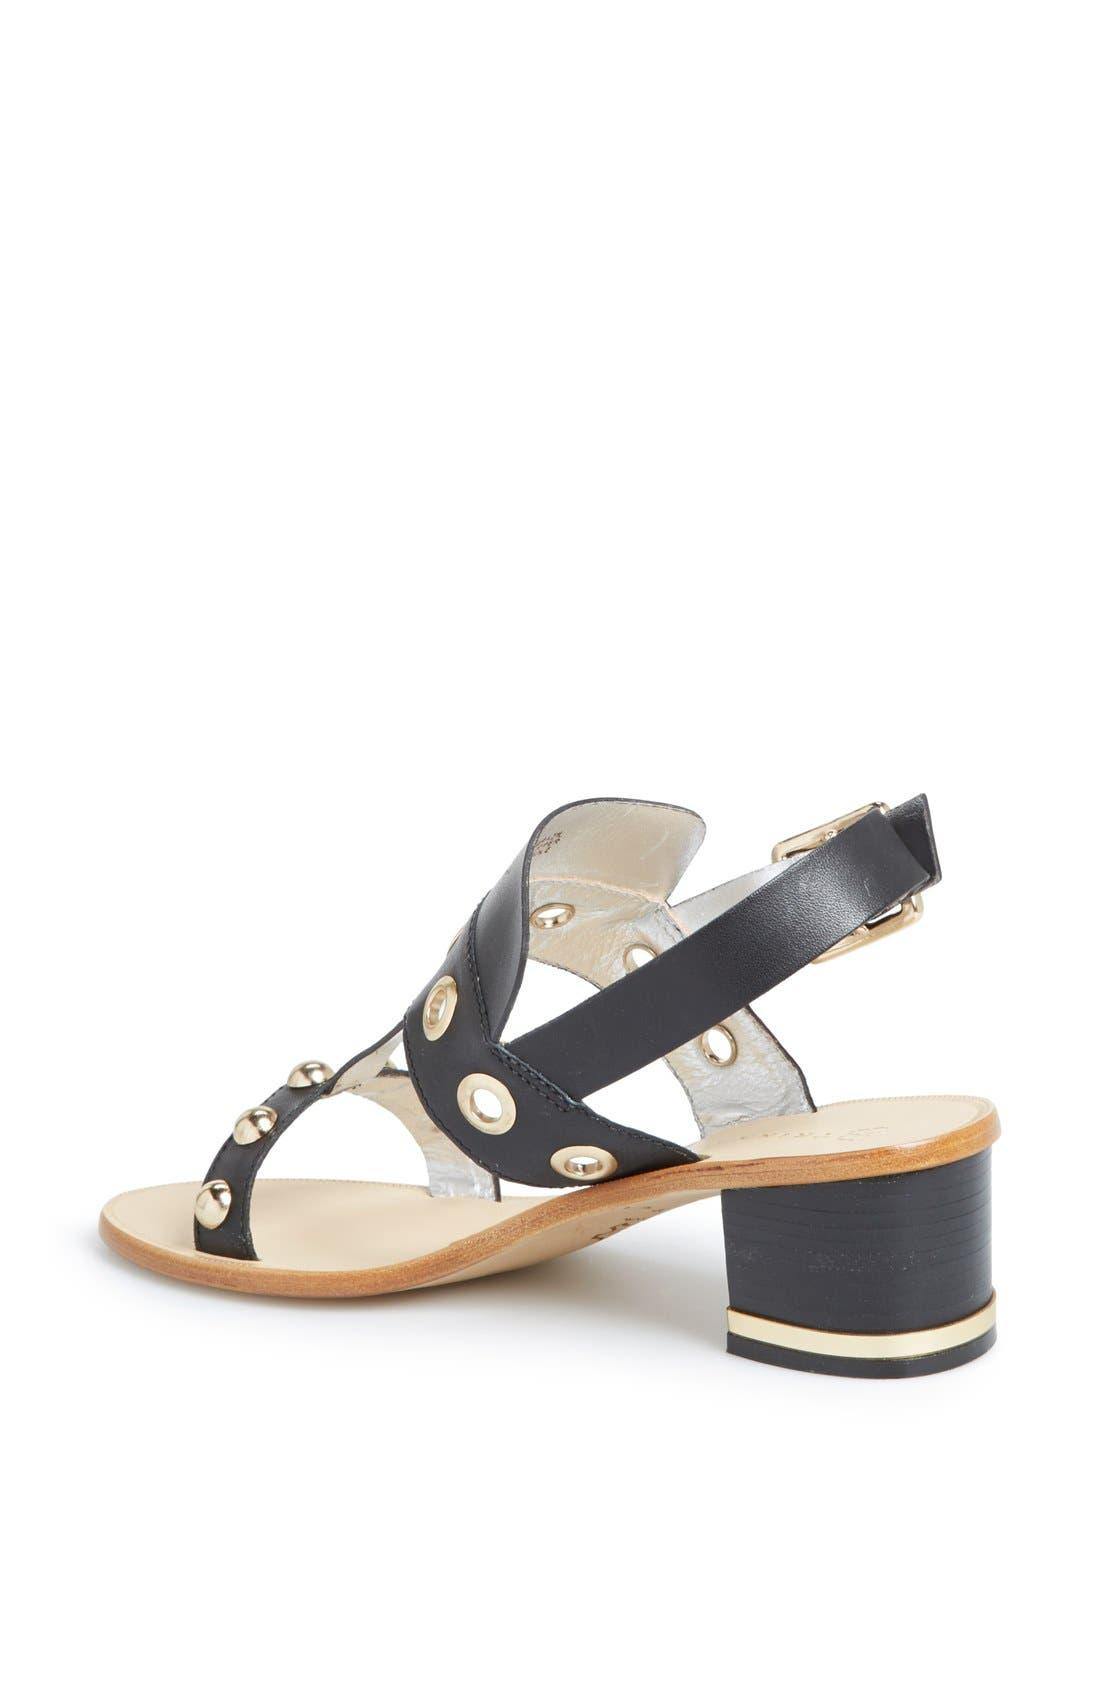 Alternate Image 2  - Trina Turk 'Atwater' Studded Slingback Sandal